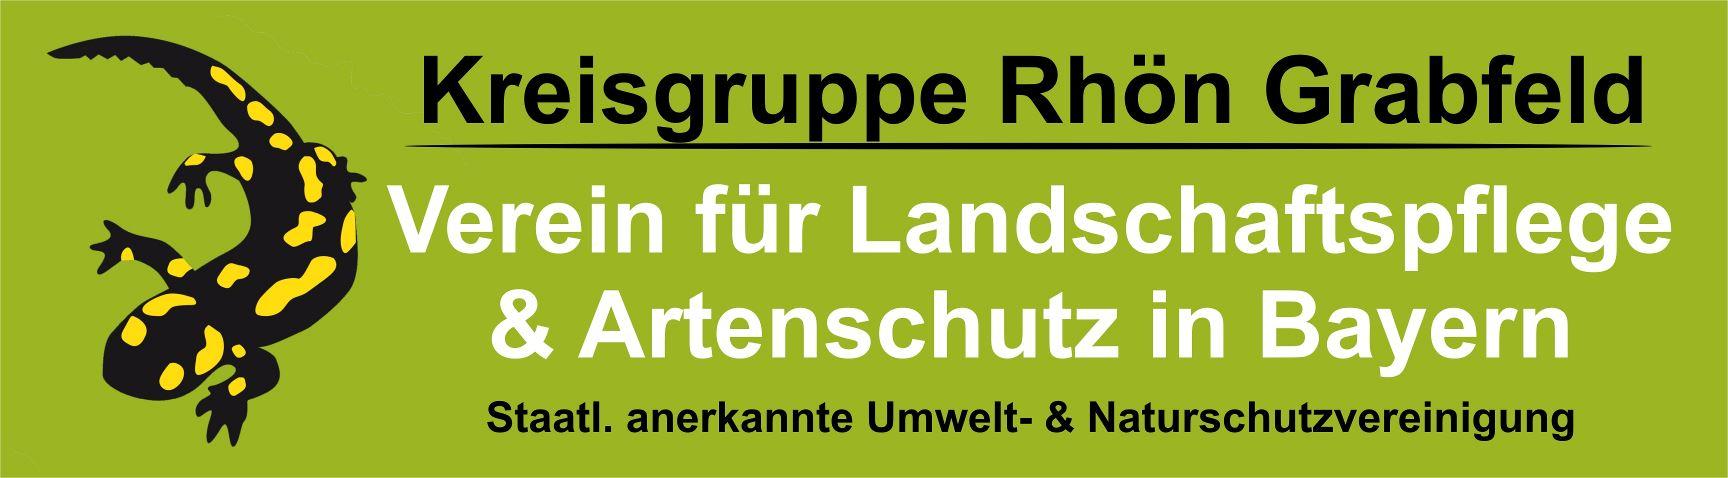 Erste VLAB Kreisgruppe in Bayern gegründet Bild © VLAB-Kreisgruppe Rhön-Grabfeld